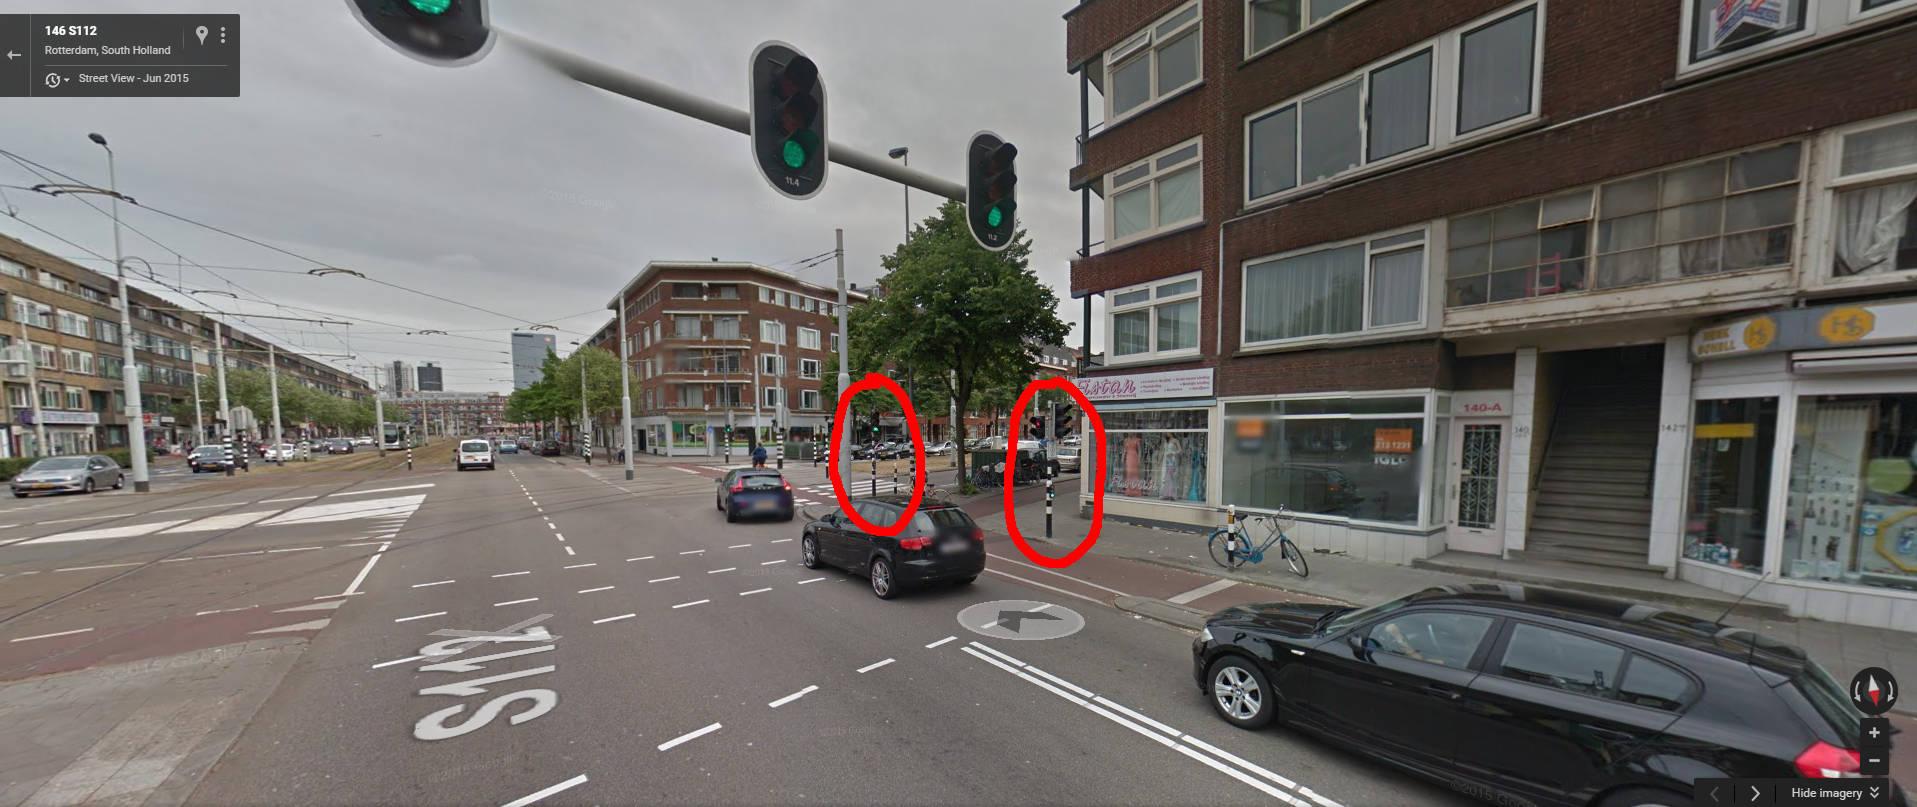 Schieweg - Rotterdam